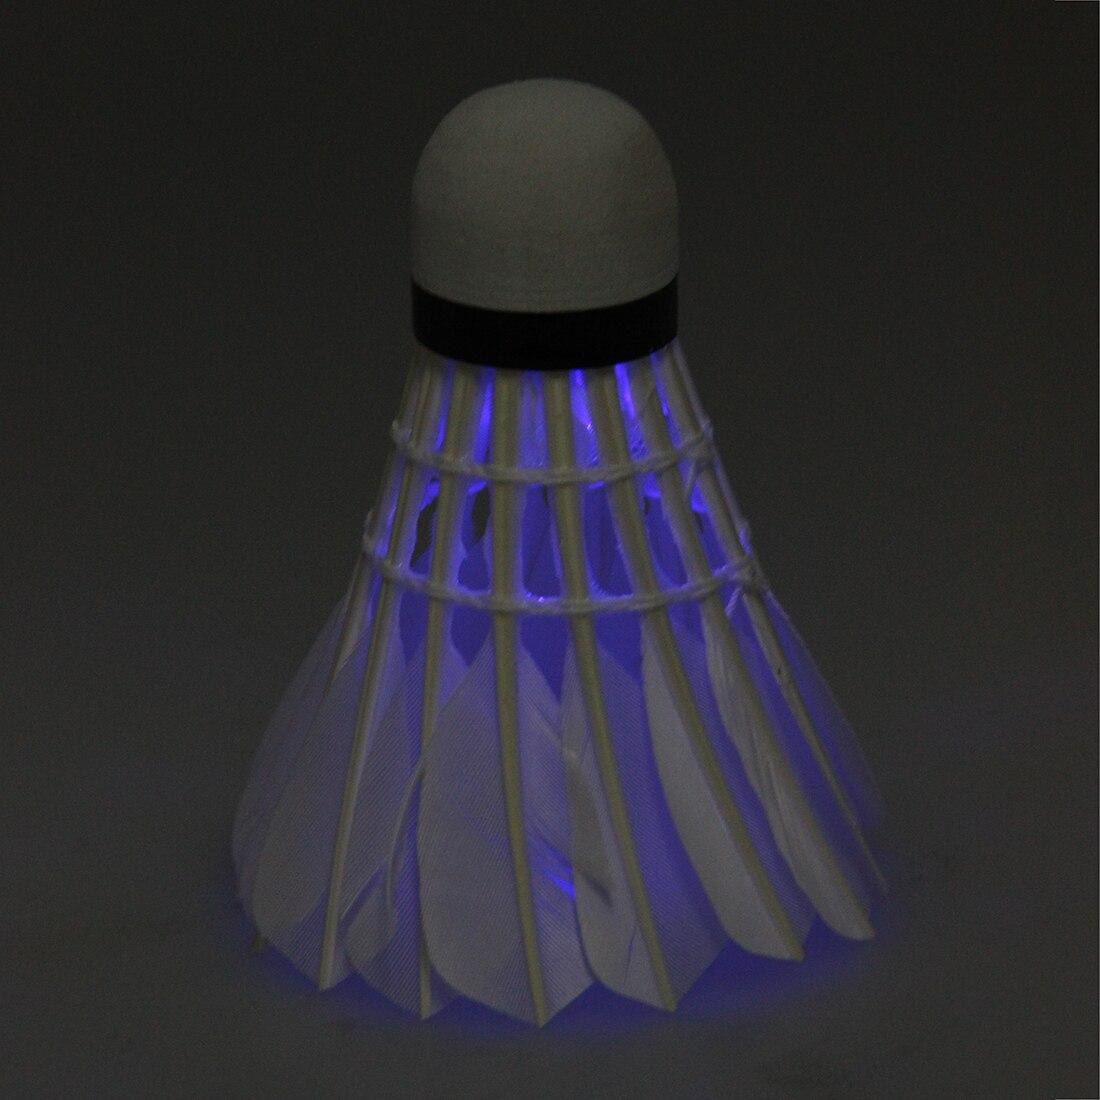 5Set Sale Dark Night LED Badminton Shuttlecock Birdies Lighting (Pack of 3) (blue)